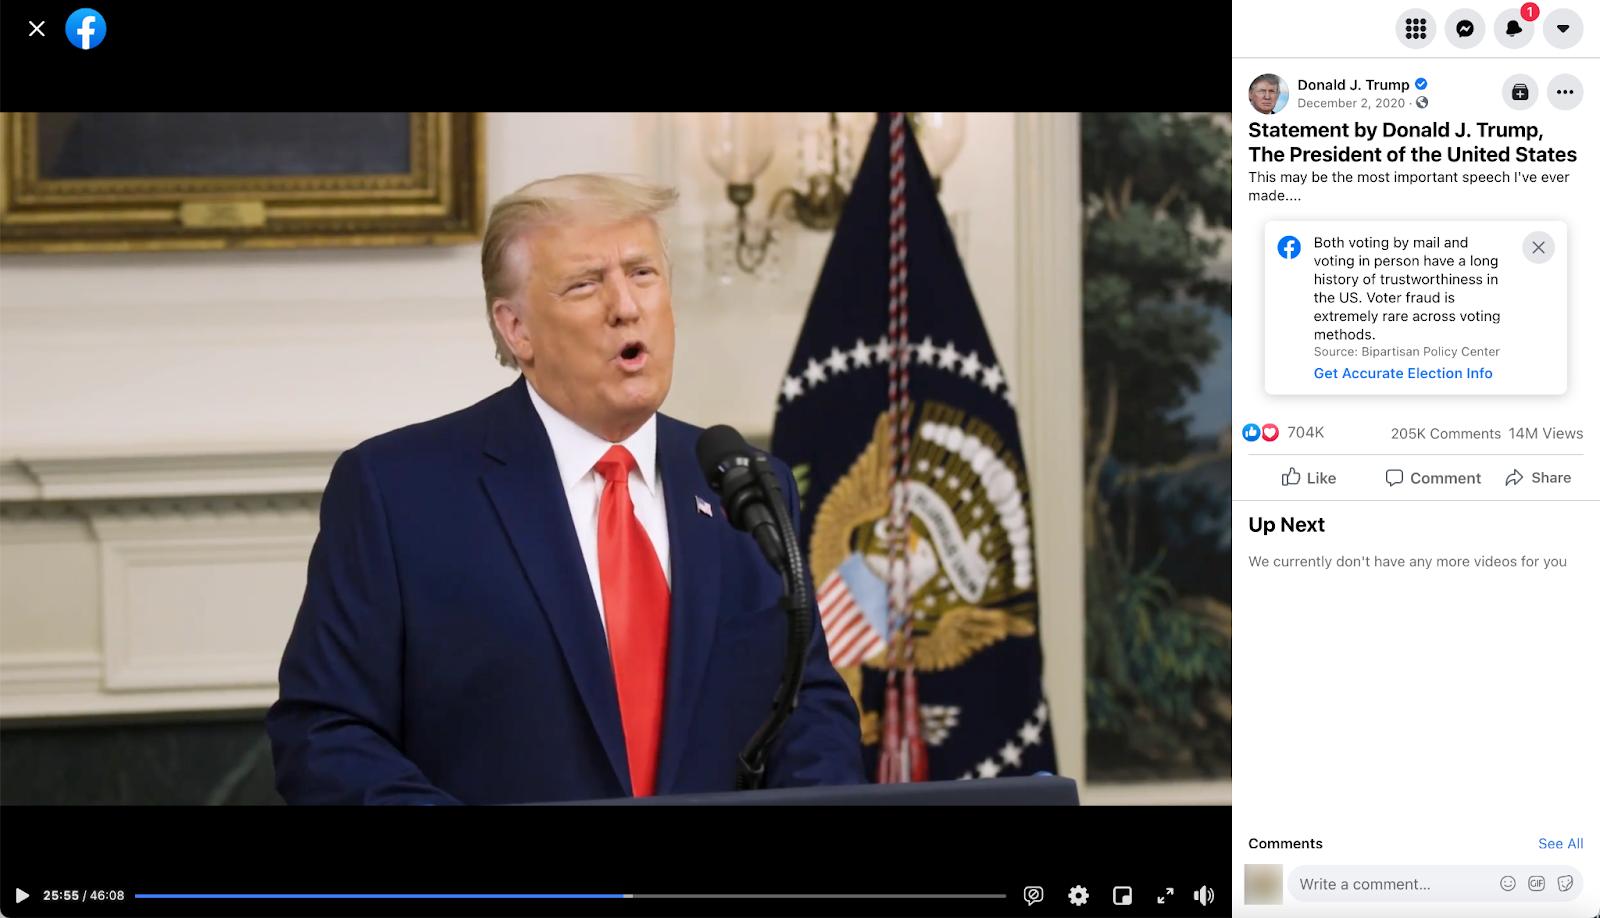 Donald Trump_facebook post_20201202